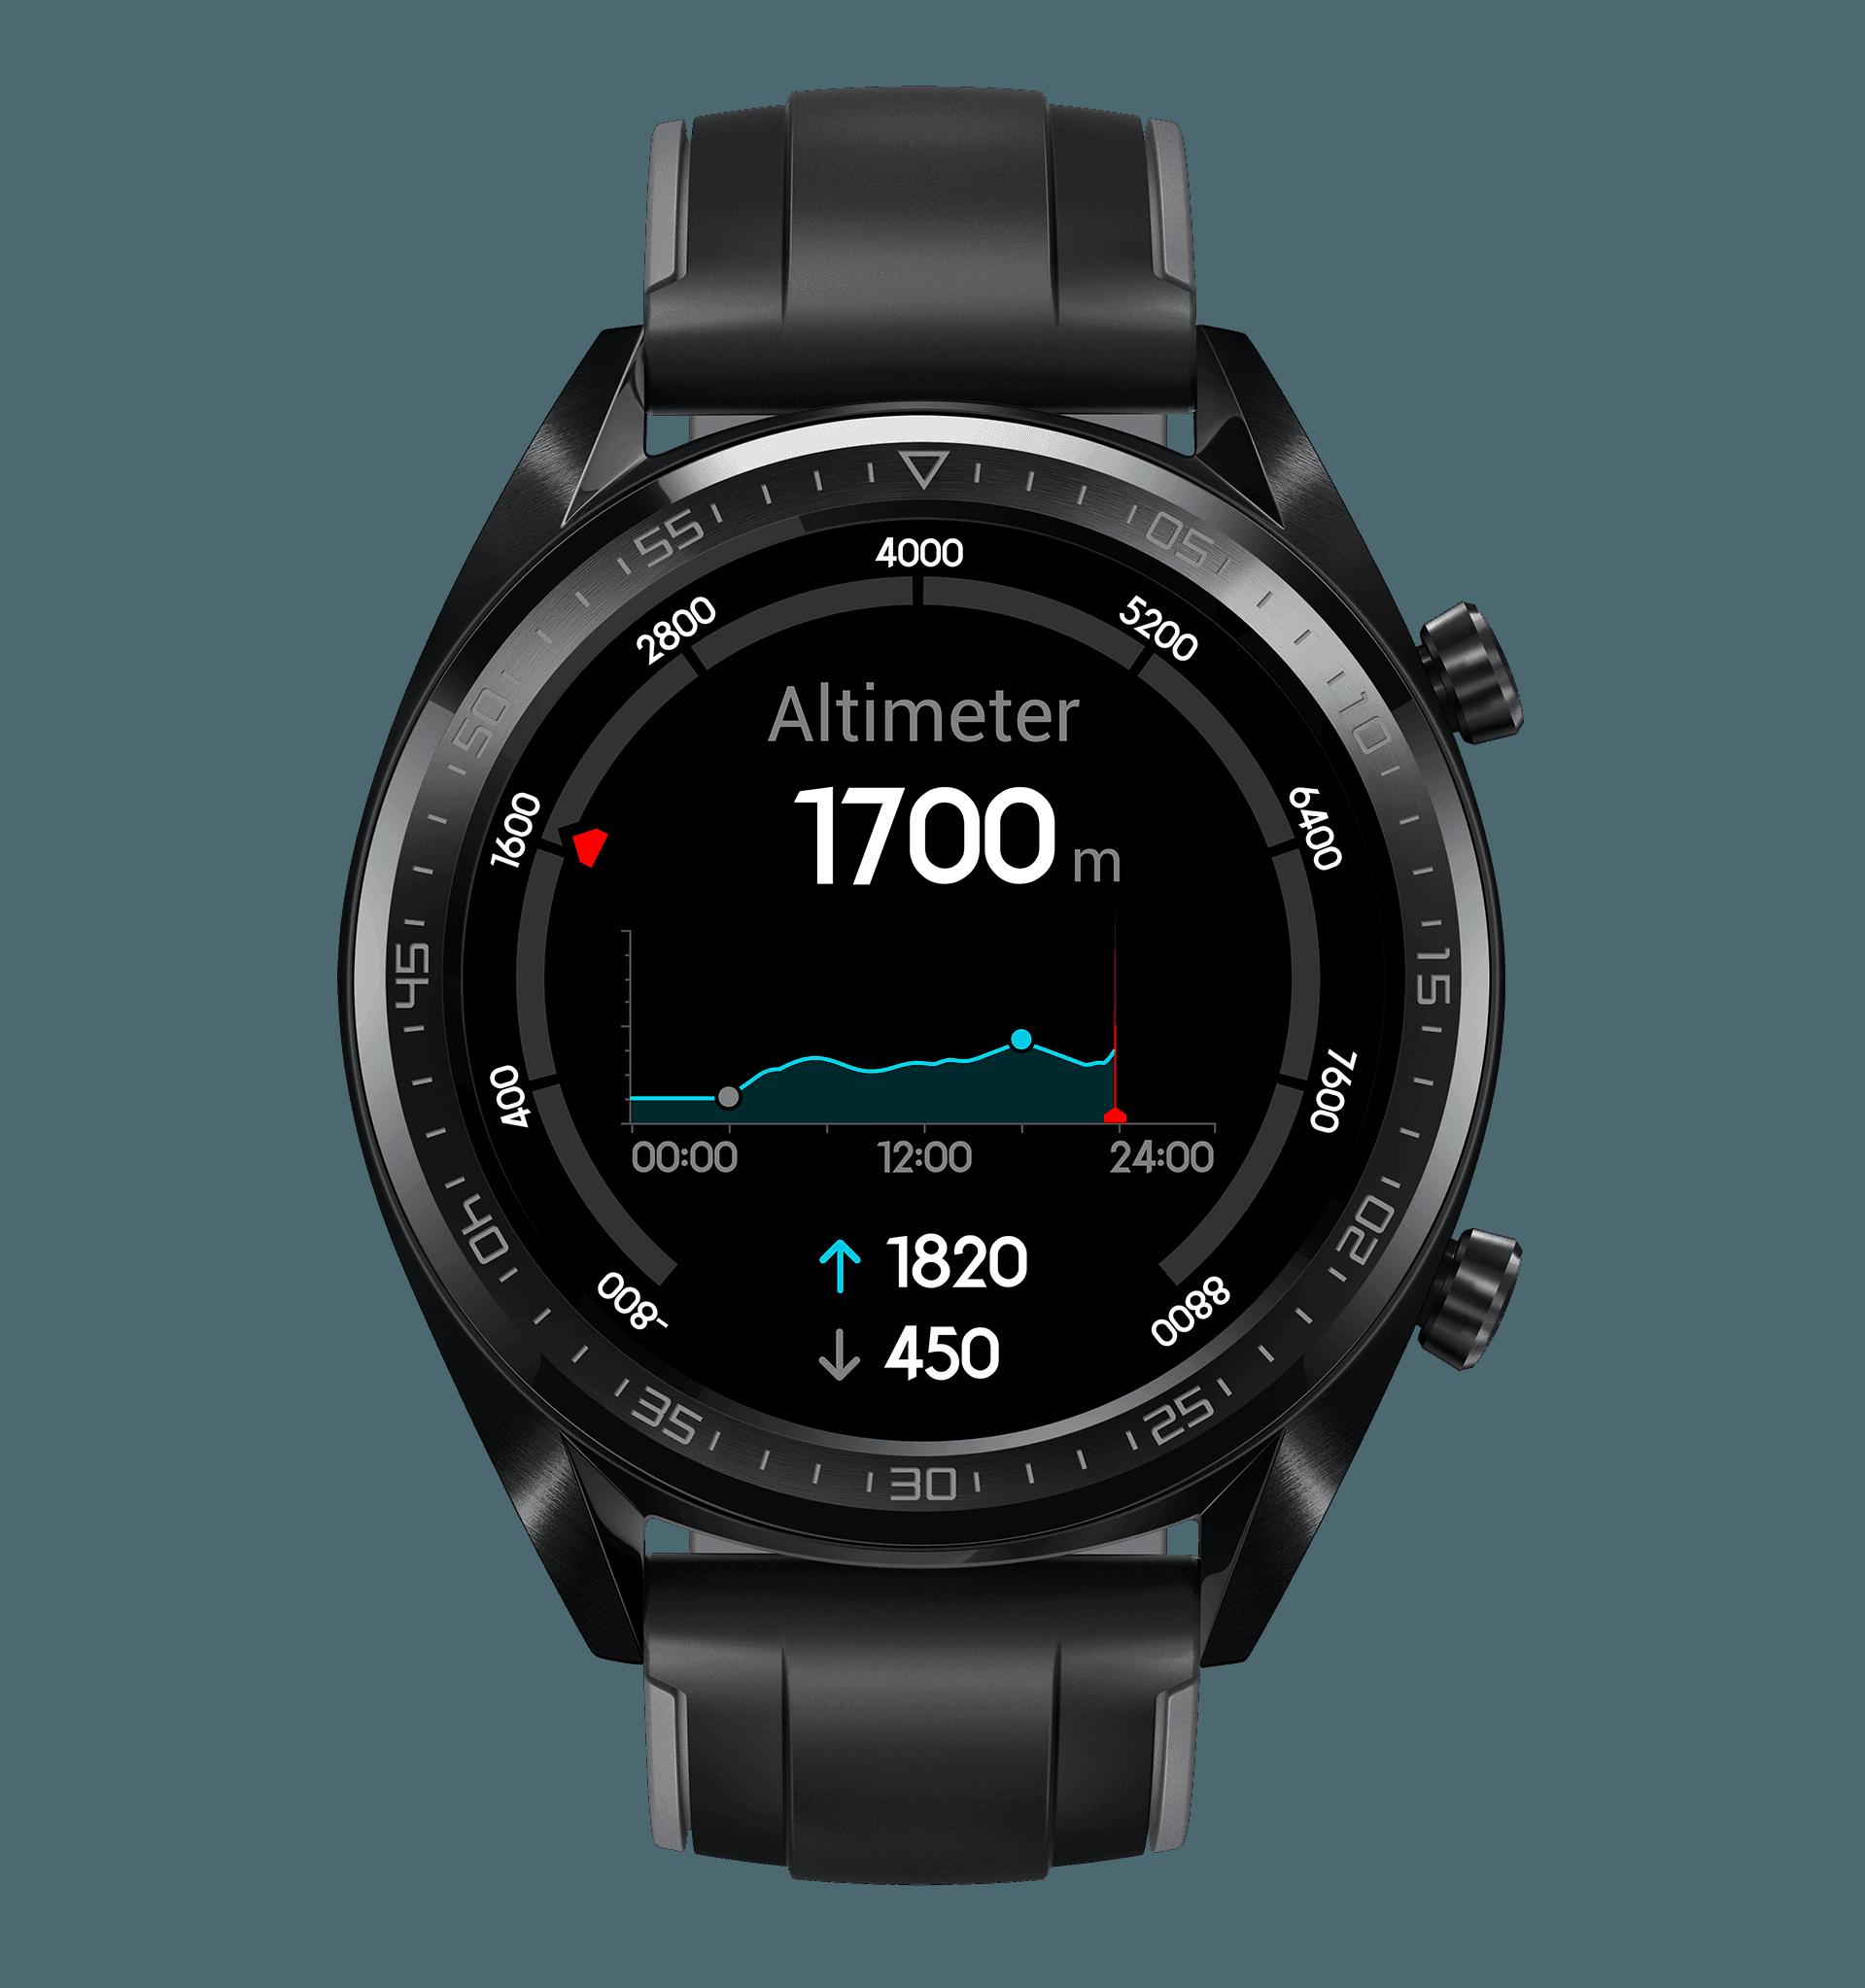 Watch GT, Band 3e und Band 3 Pro: Huawei stellt neue Wearables vor 13 techboys.de • smarte News, auf den Punkt! Watch GT, Band 3e und Band 3 Pro: Huawei stellt neue Wearables vor